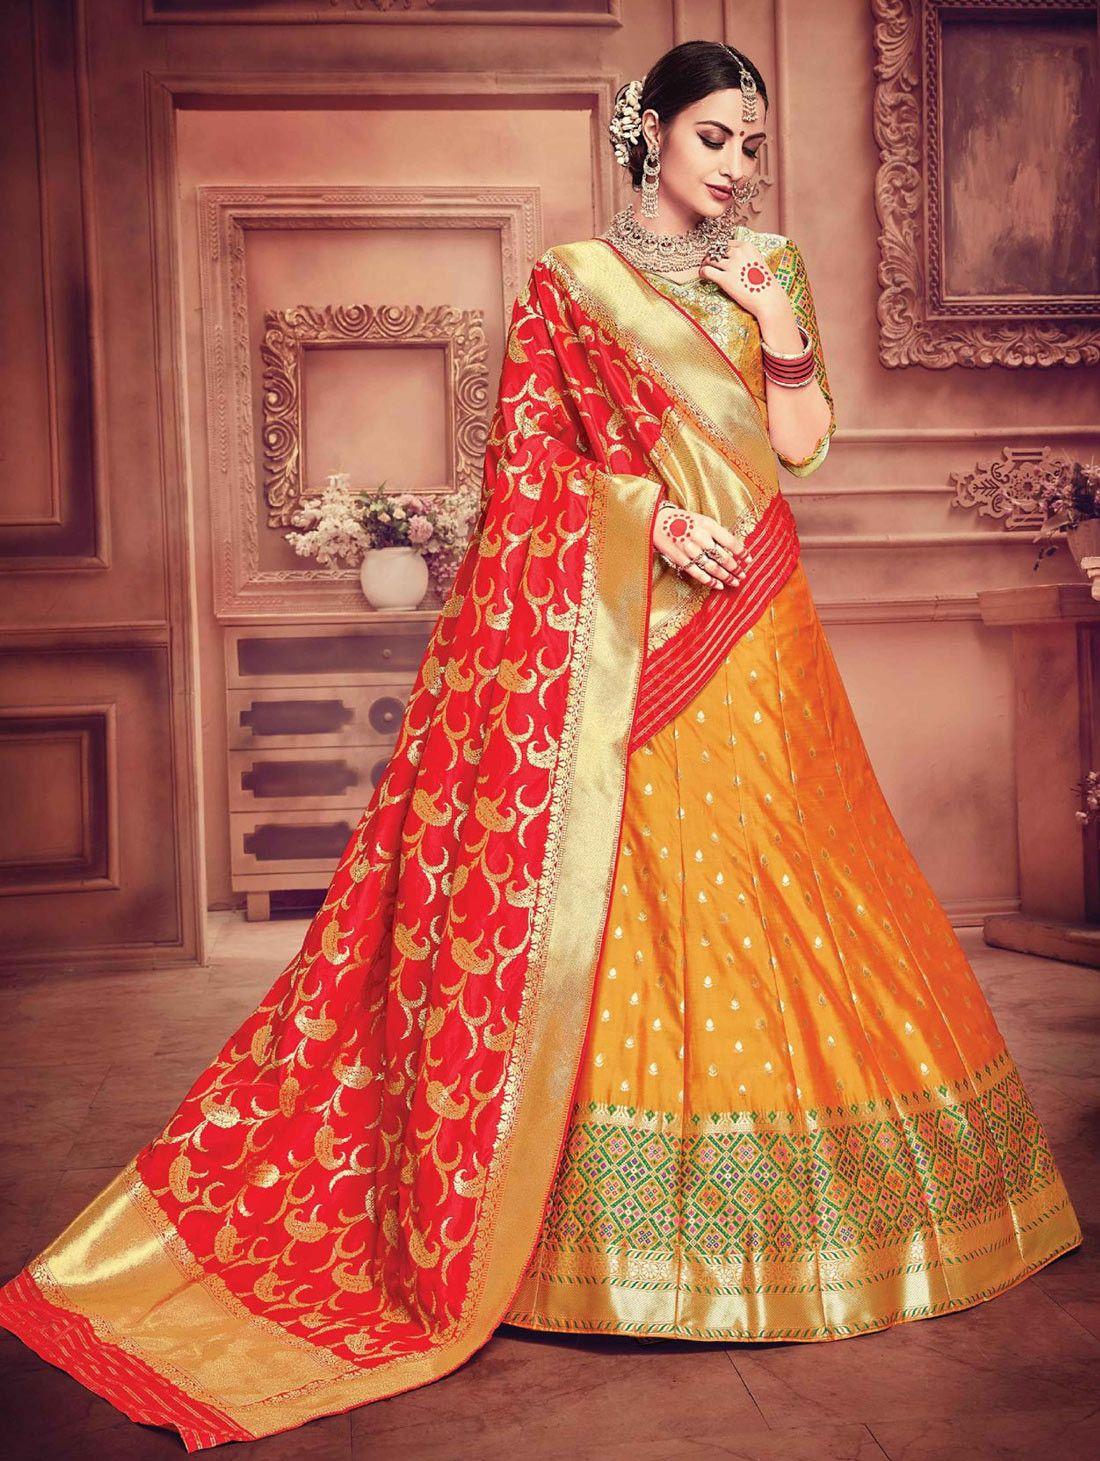 bf92391709 Orange Pure banarasi silk leheng choli with contrast red dupatta ...